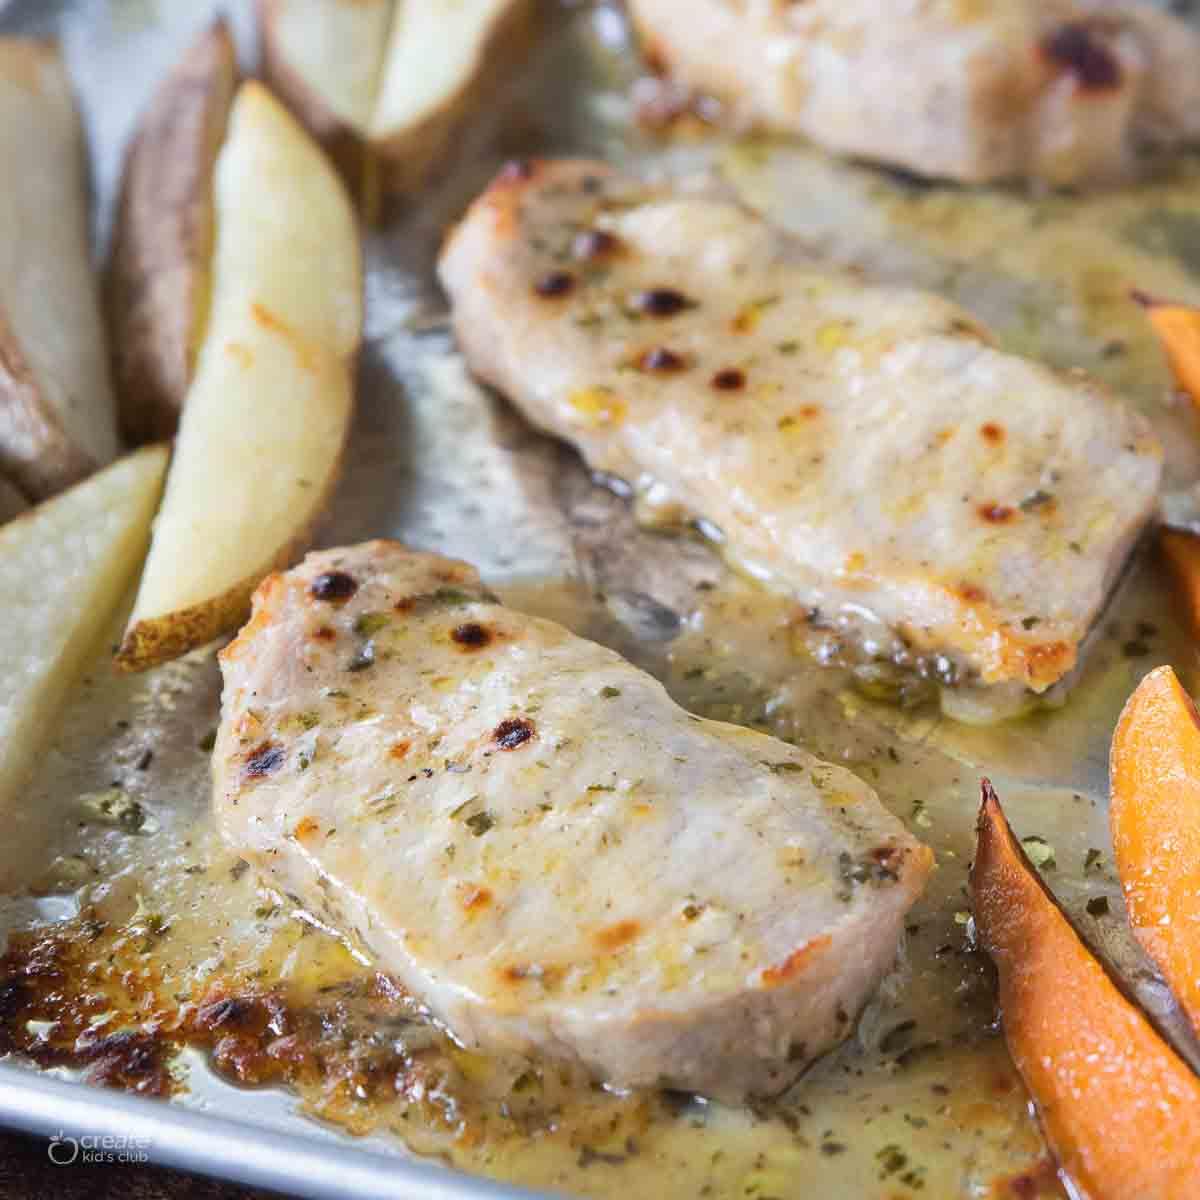 marinated pork chop on sheet pan with potatoes